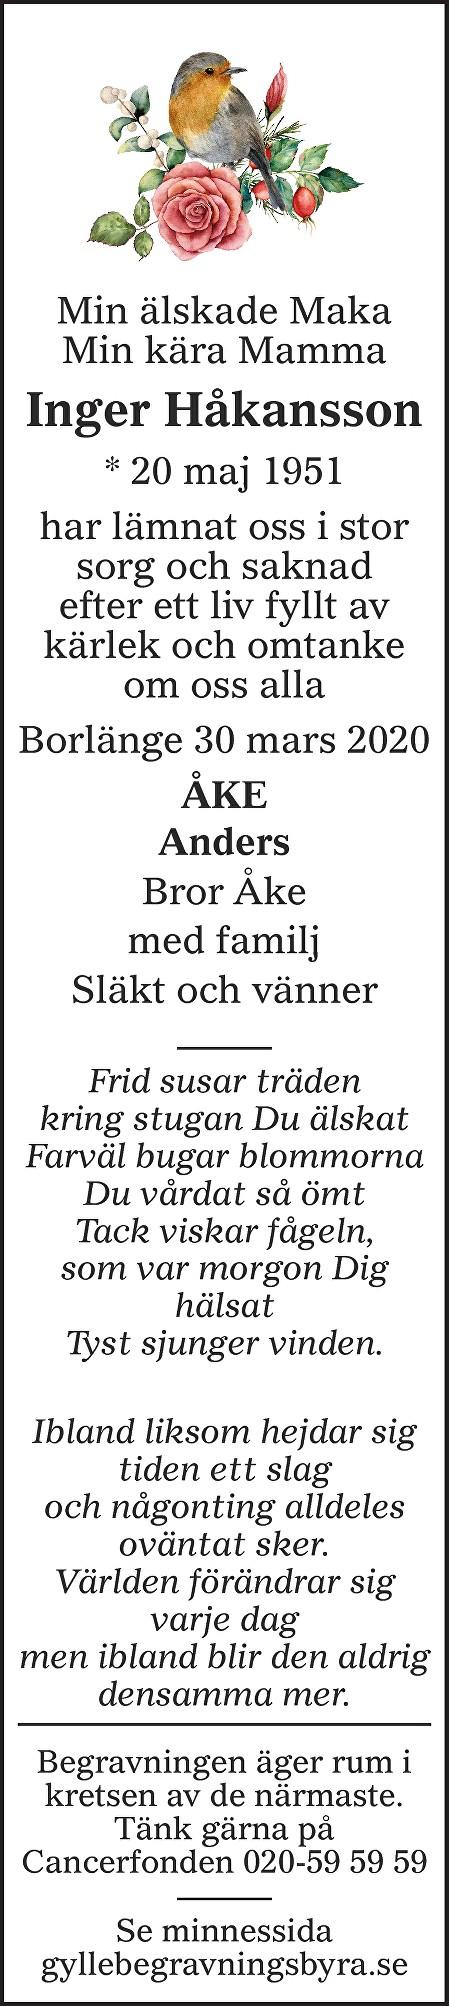 Inger Håkansson Death notice